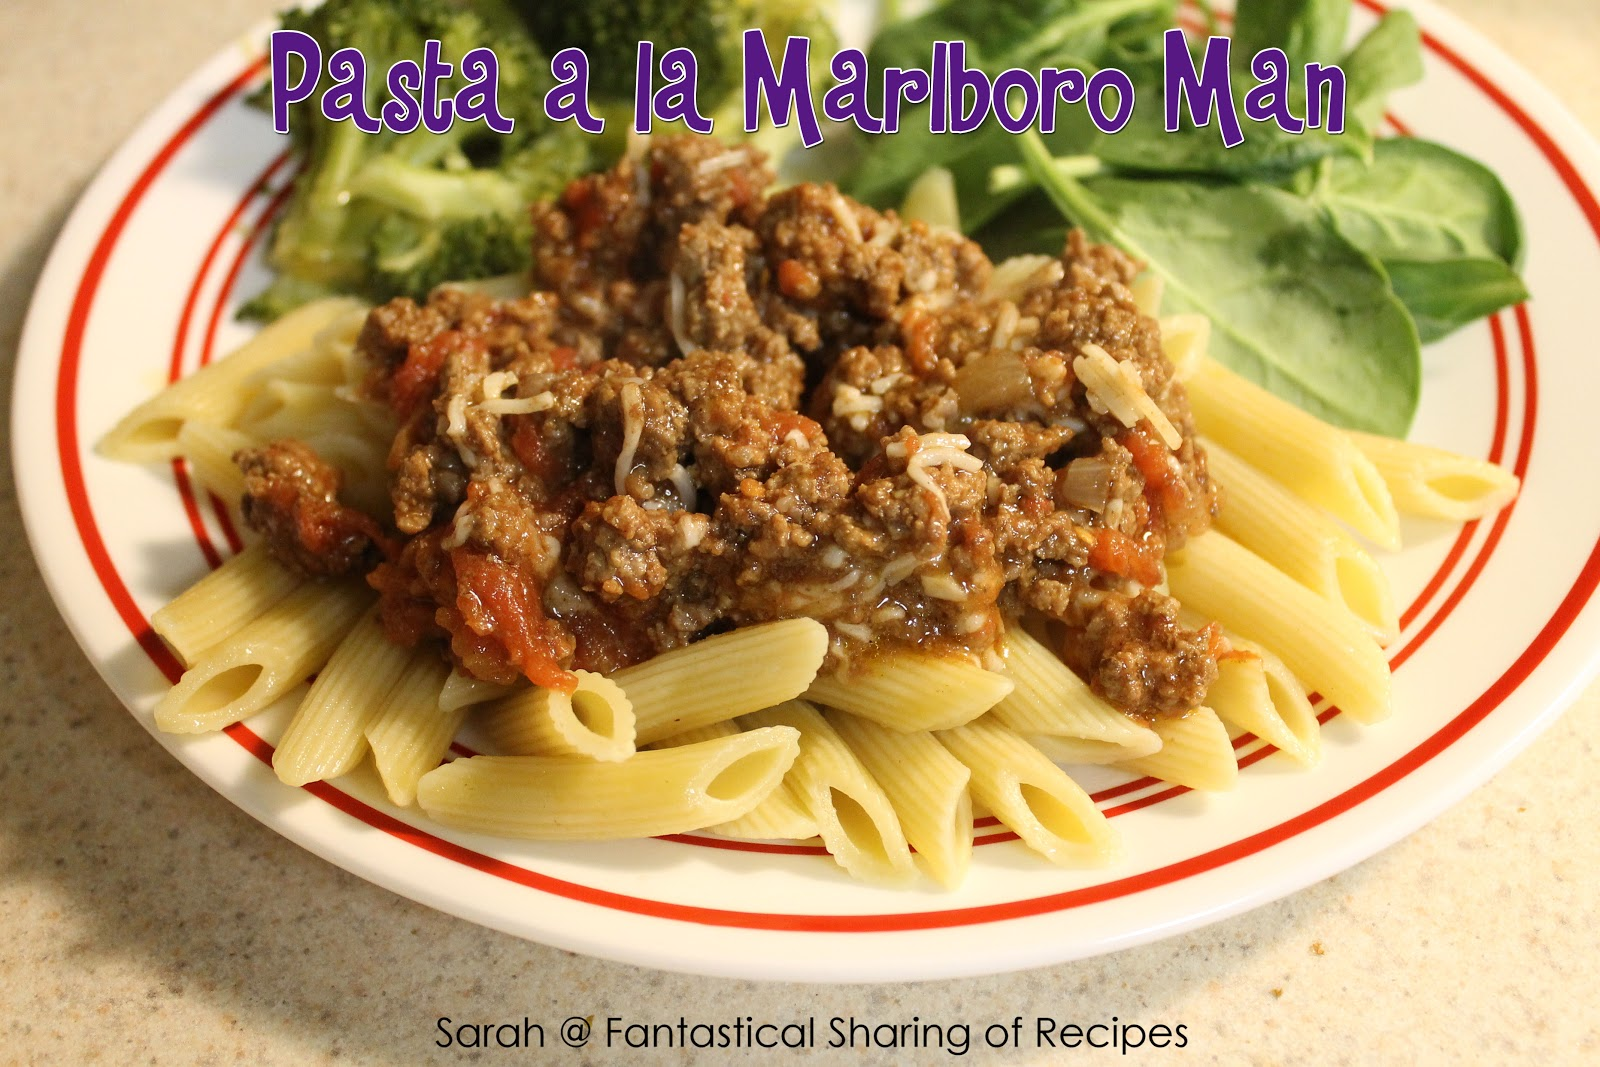 Fantastical Sharing of Recipes: Pasta alla Marlboro Man